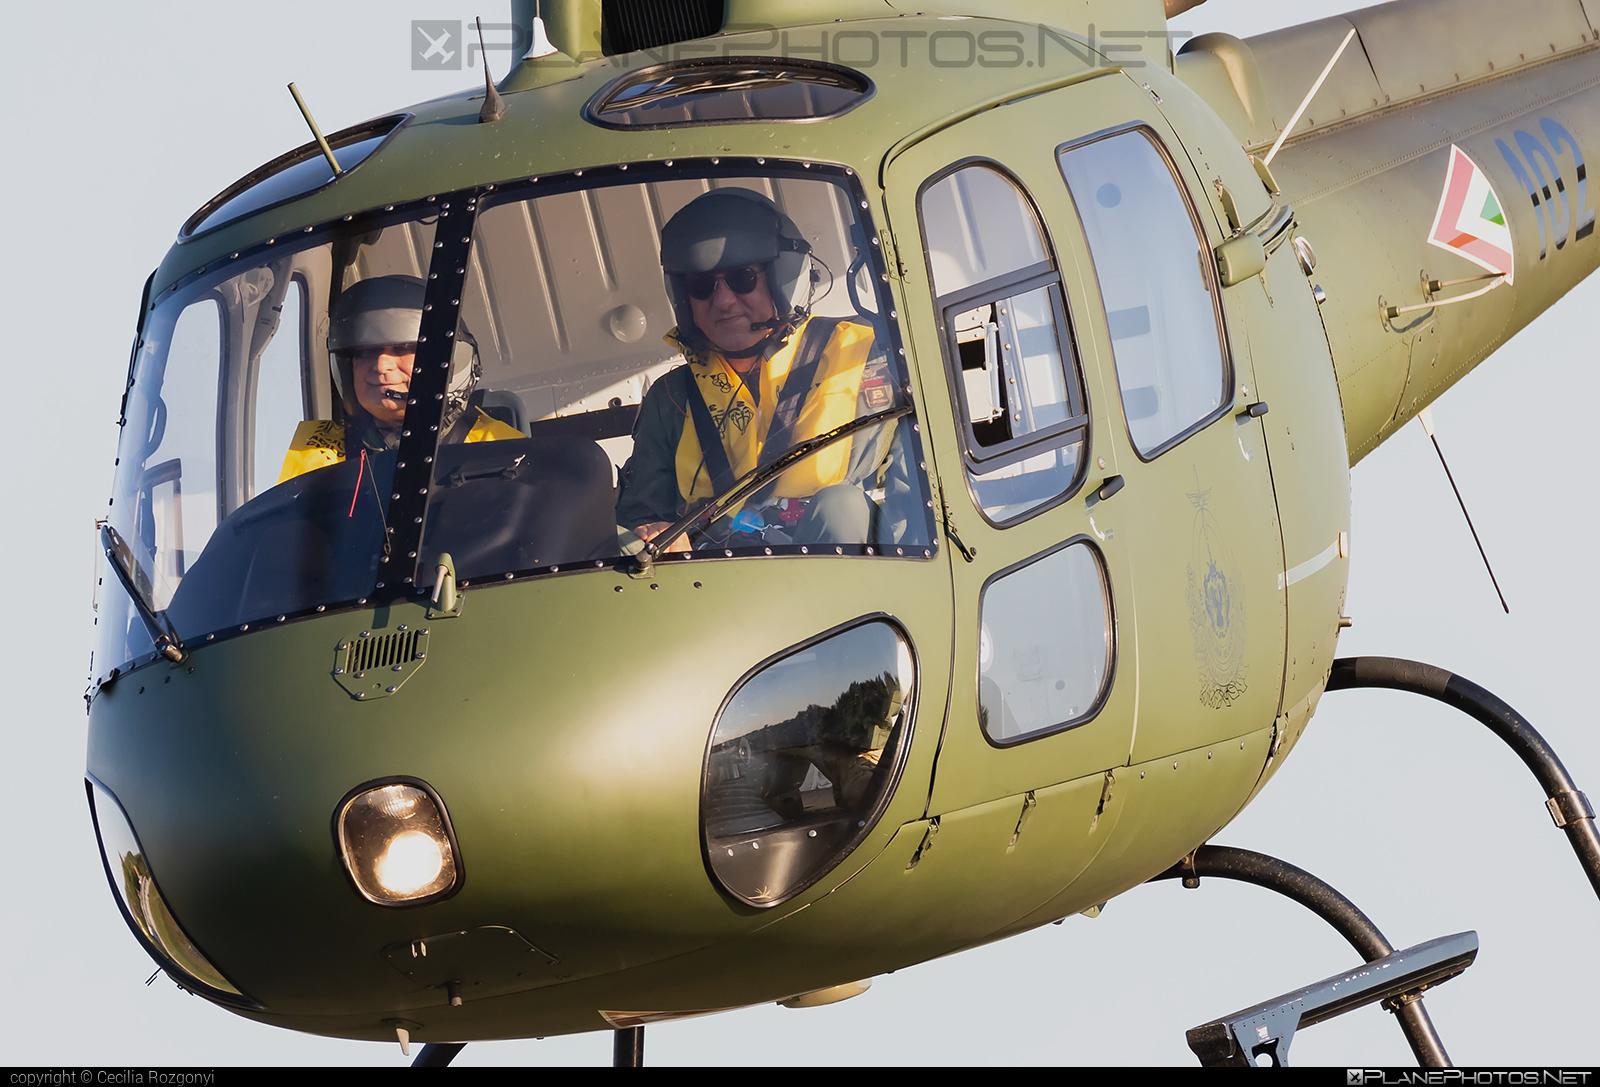 Aerospatiale AS350 B2 Ecureuil - 102 operated by Magyar Légierő (Hungarian Air Force) #aerospatiale #hungarianairforce #magyarlegiero